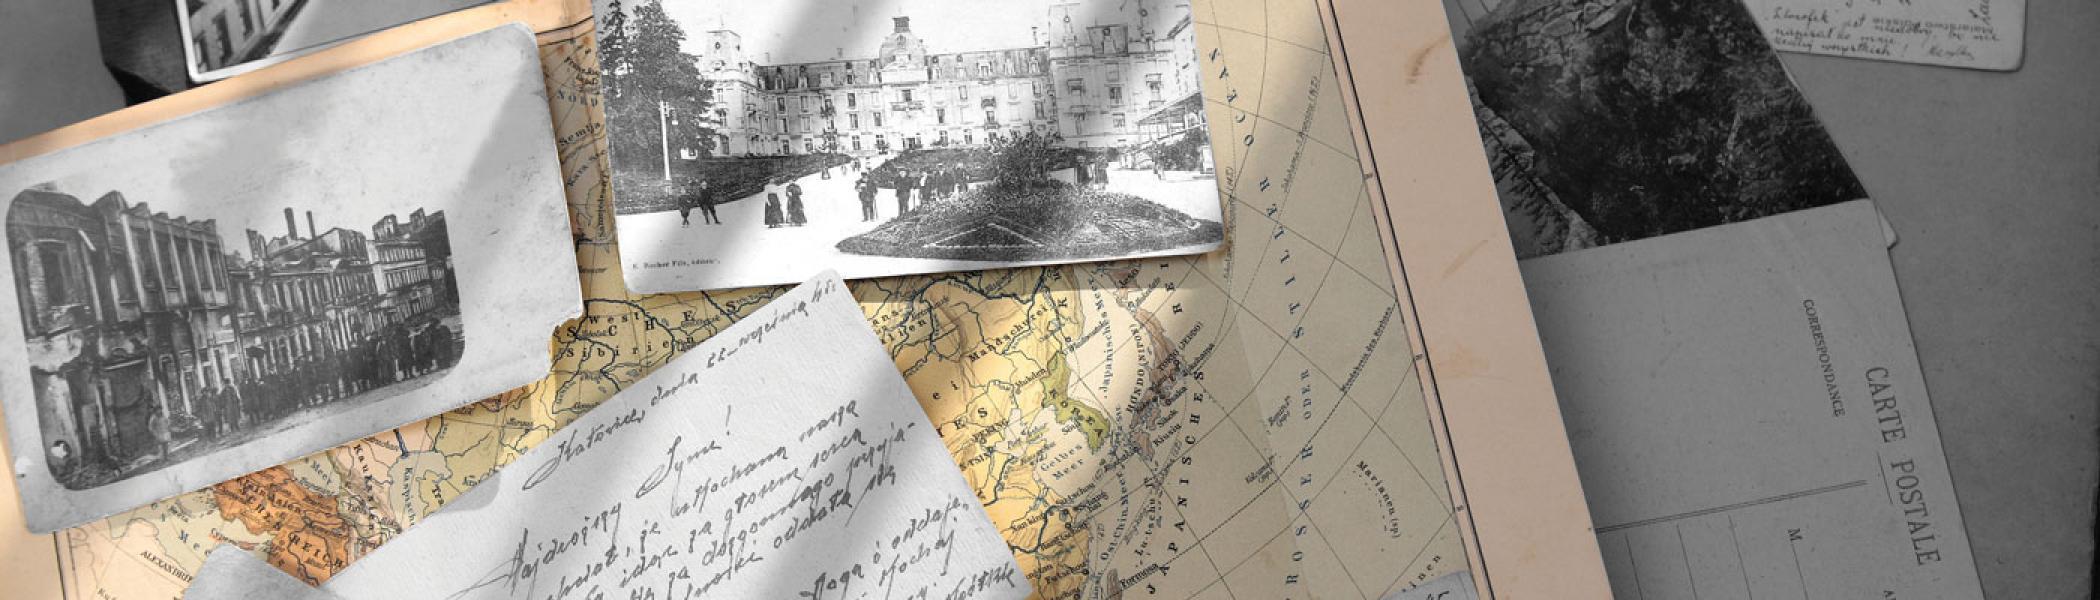 History documents